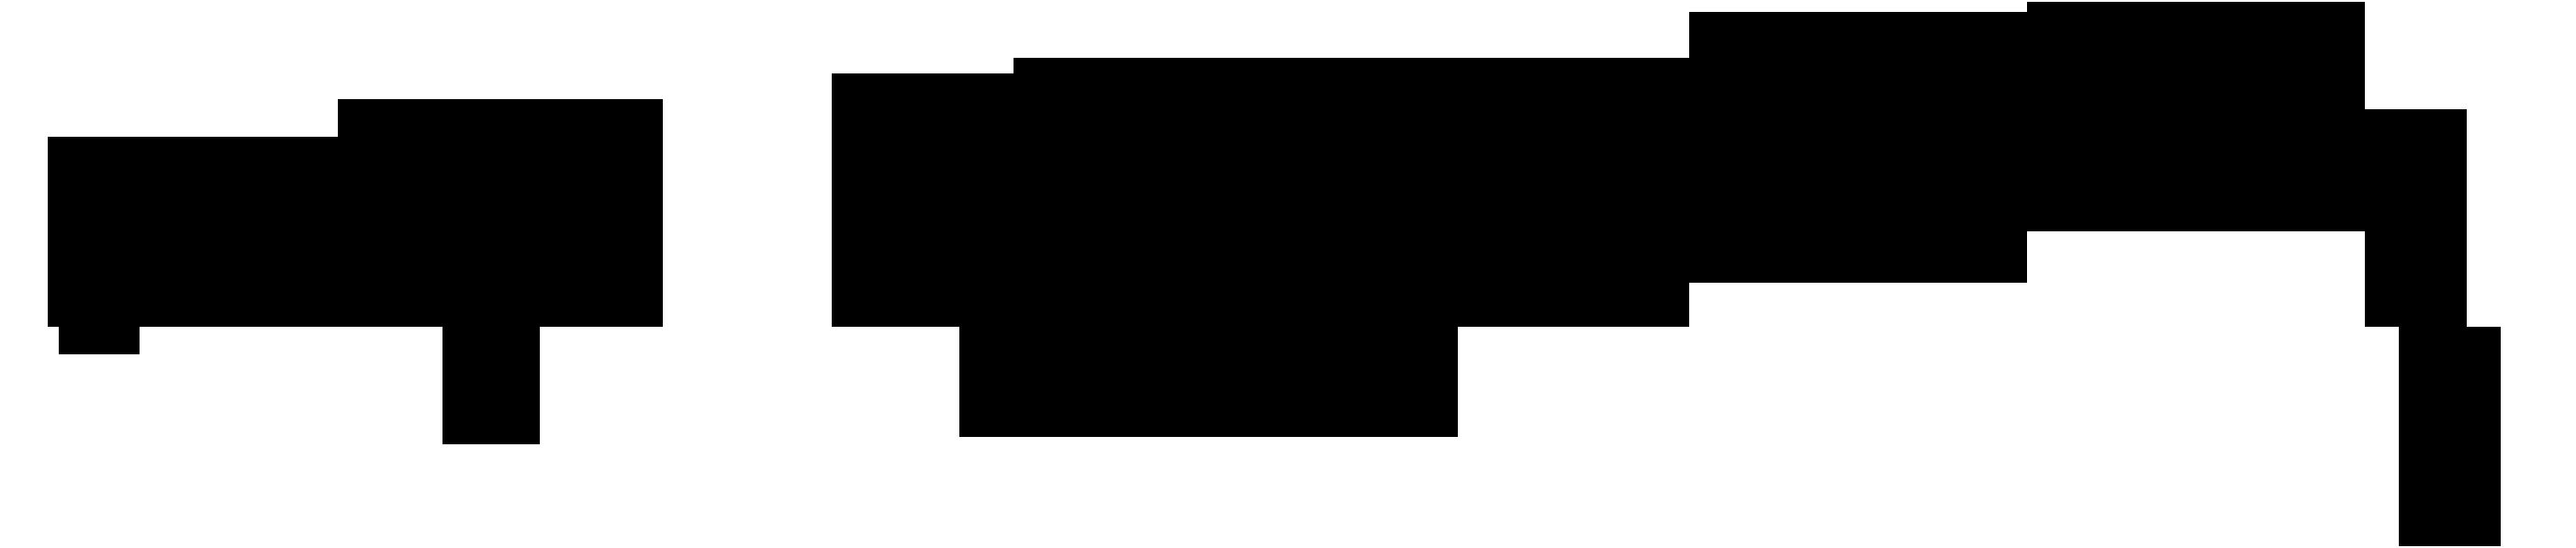 Instalacion SAXXON SD4925PRO